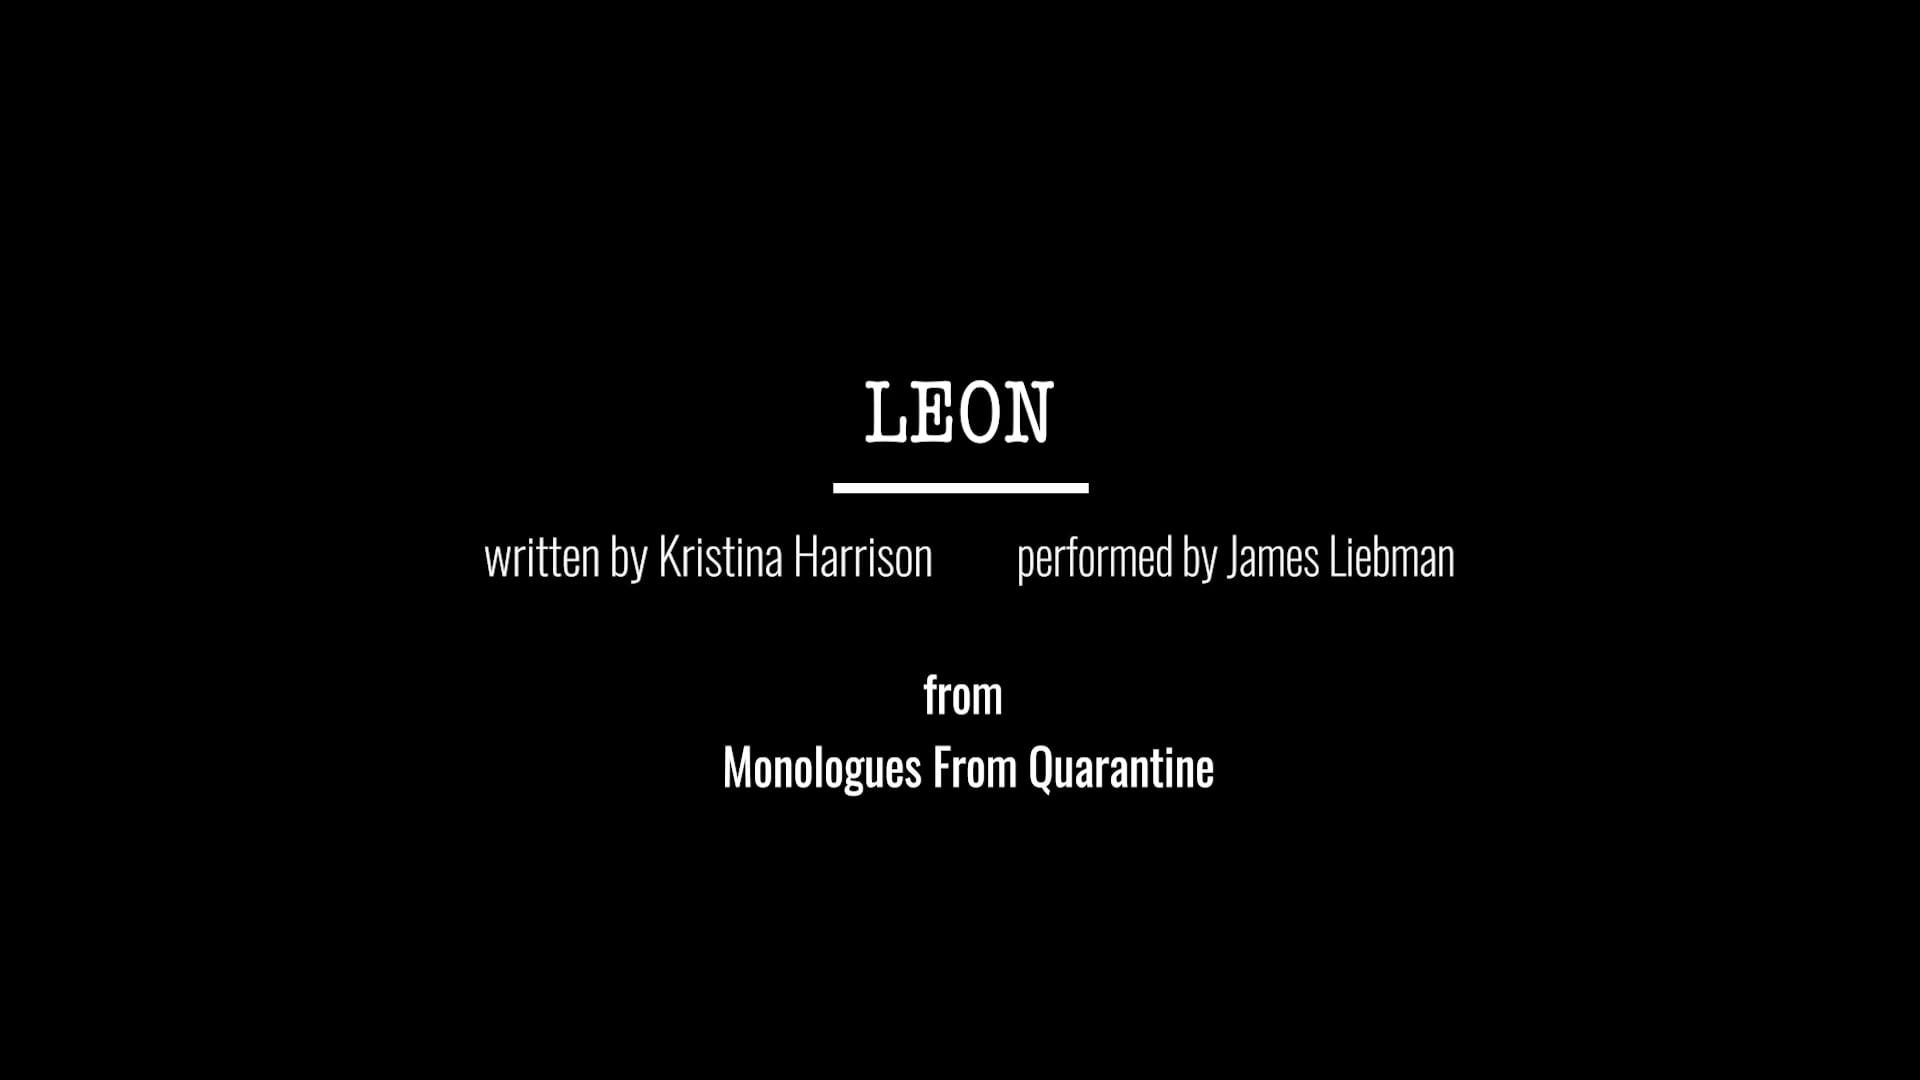 Leon - written by Kristina Harrison